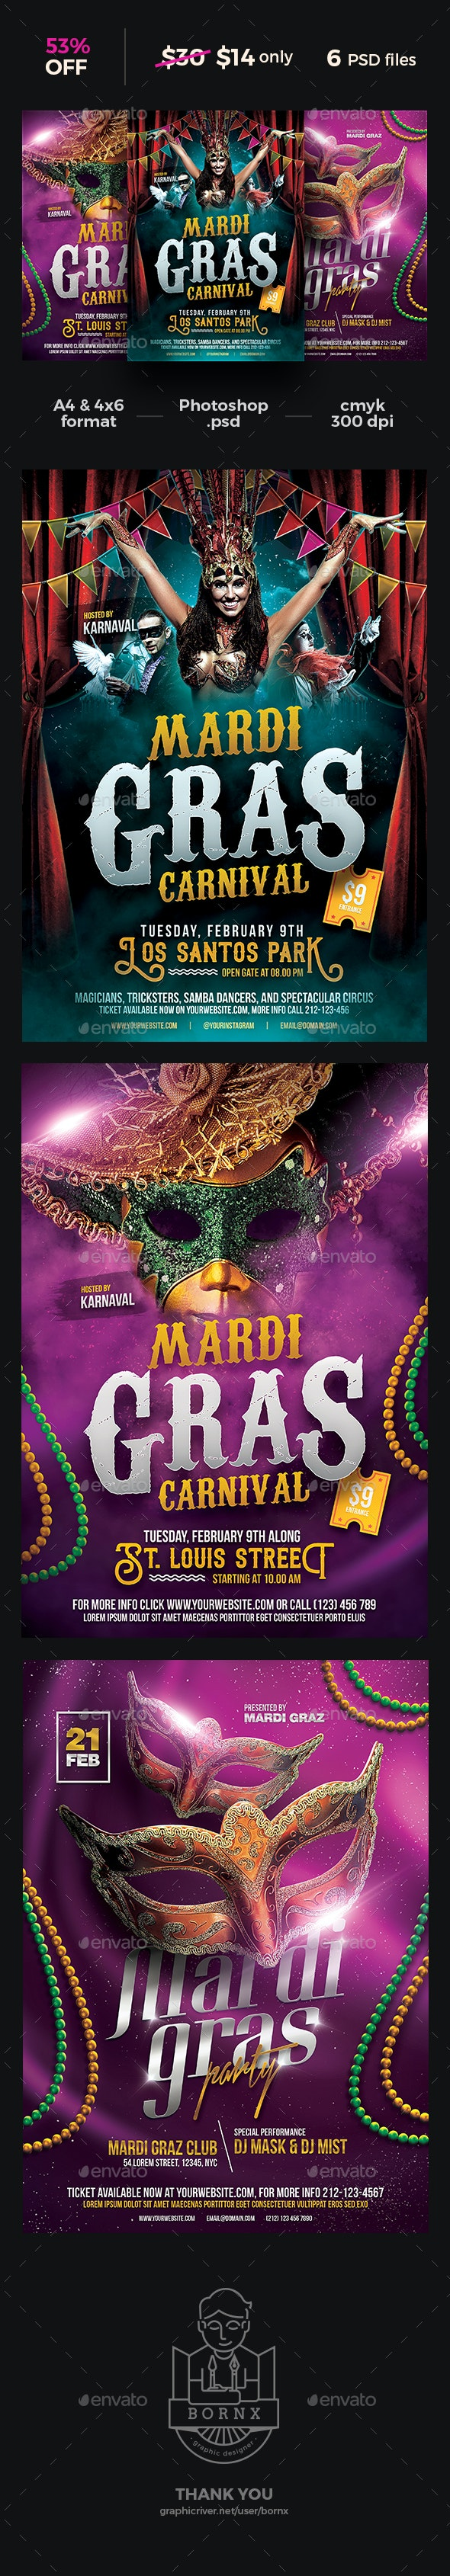 Mardi Gras Carnival Flyer Bundle - Clubs & Parties Events